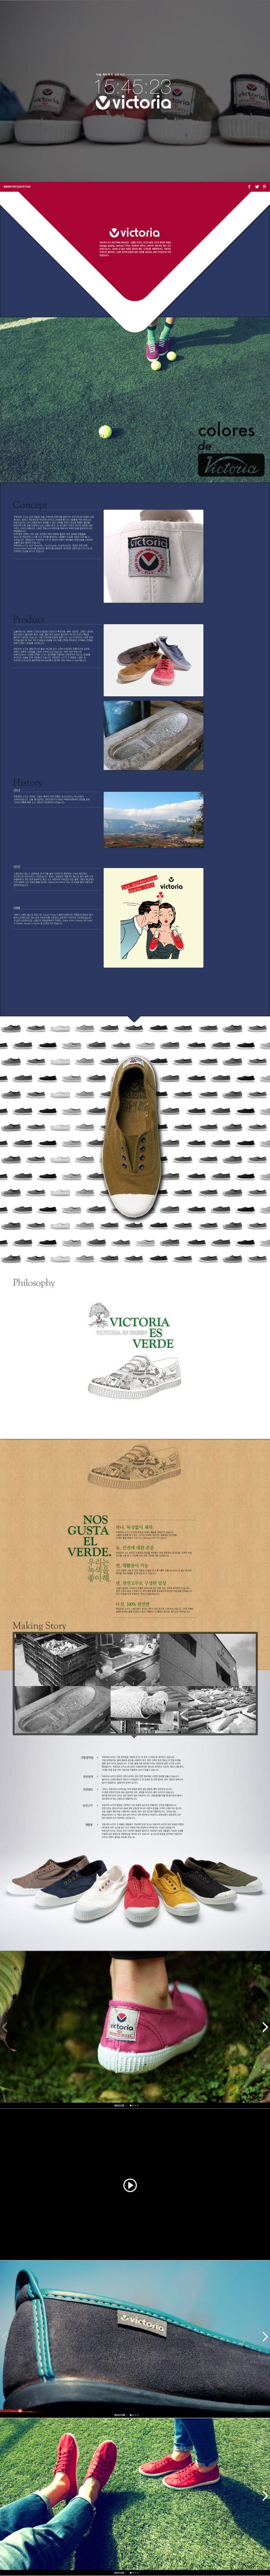 #29CM_PRESENTATION with Victoria Shoes No.1 2013.4.22 ~ 4.26